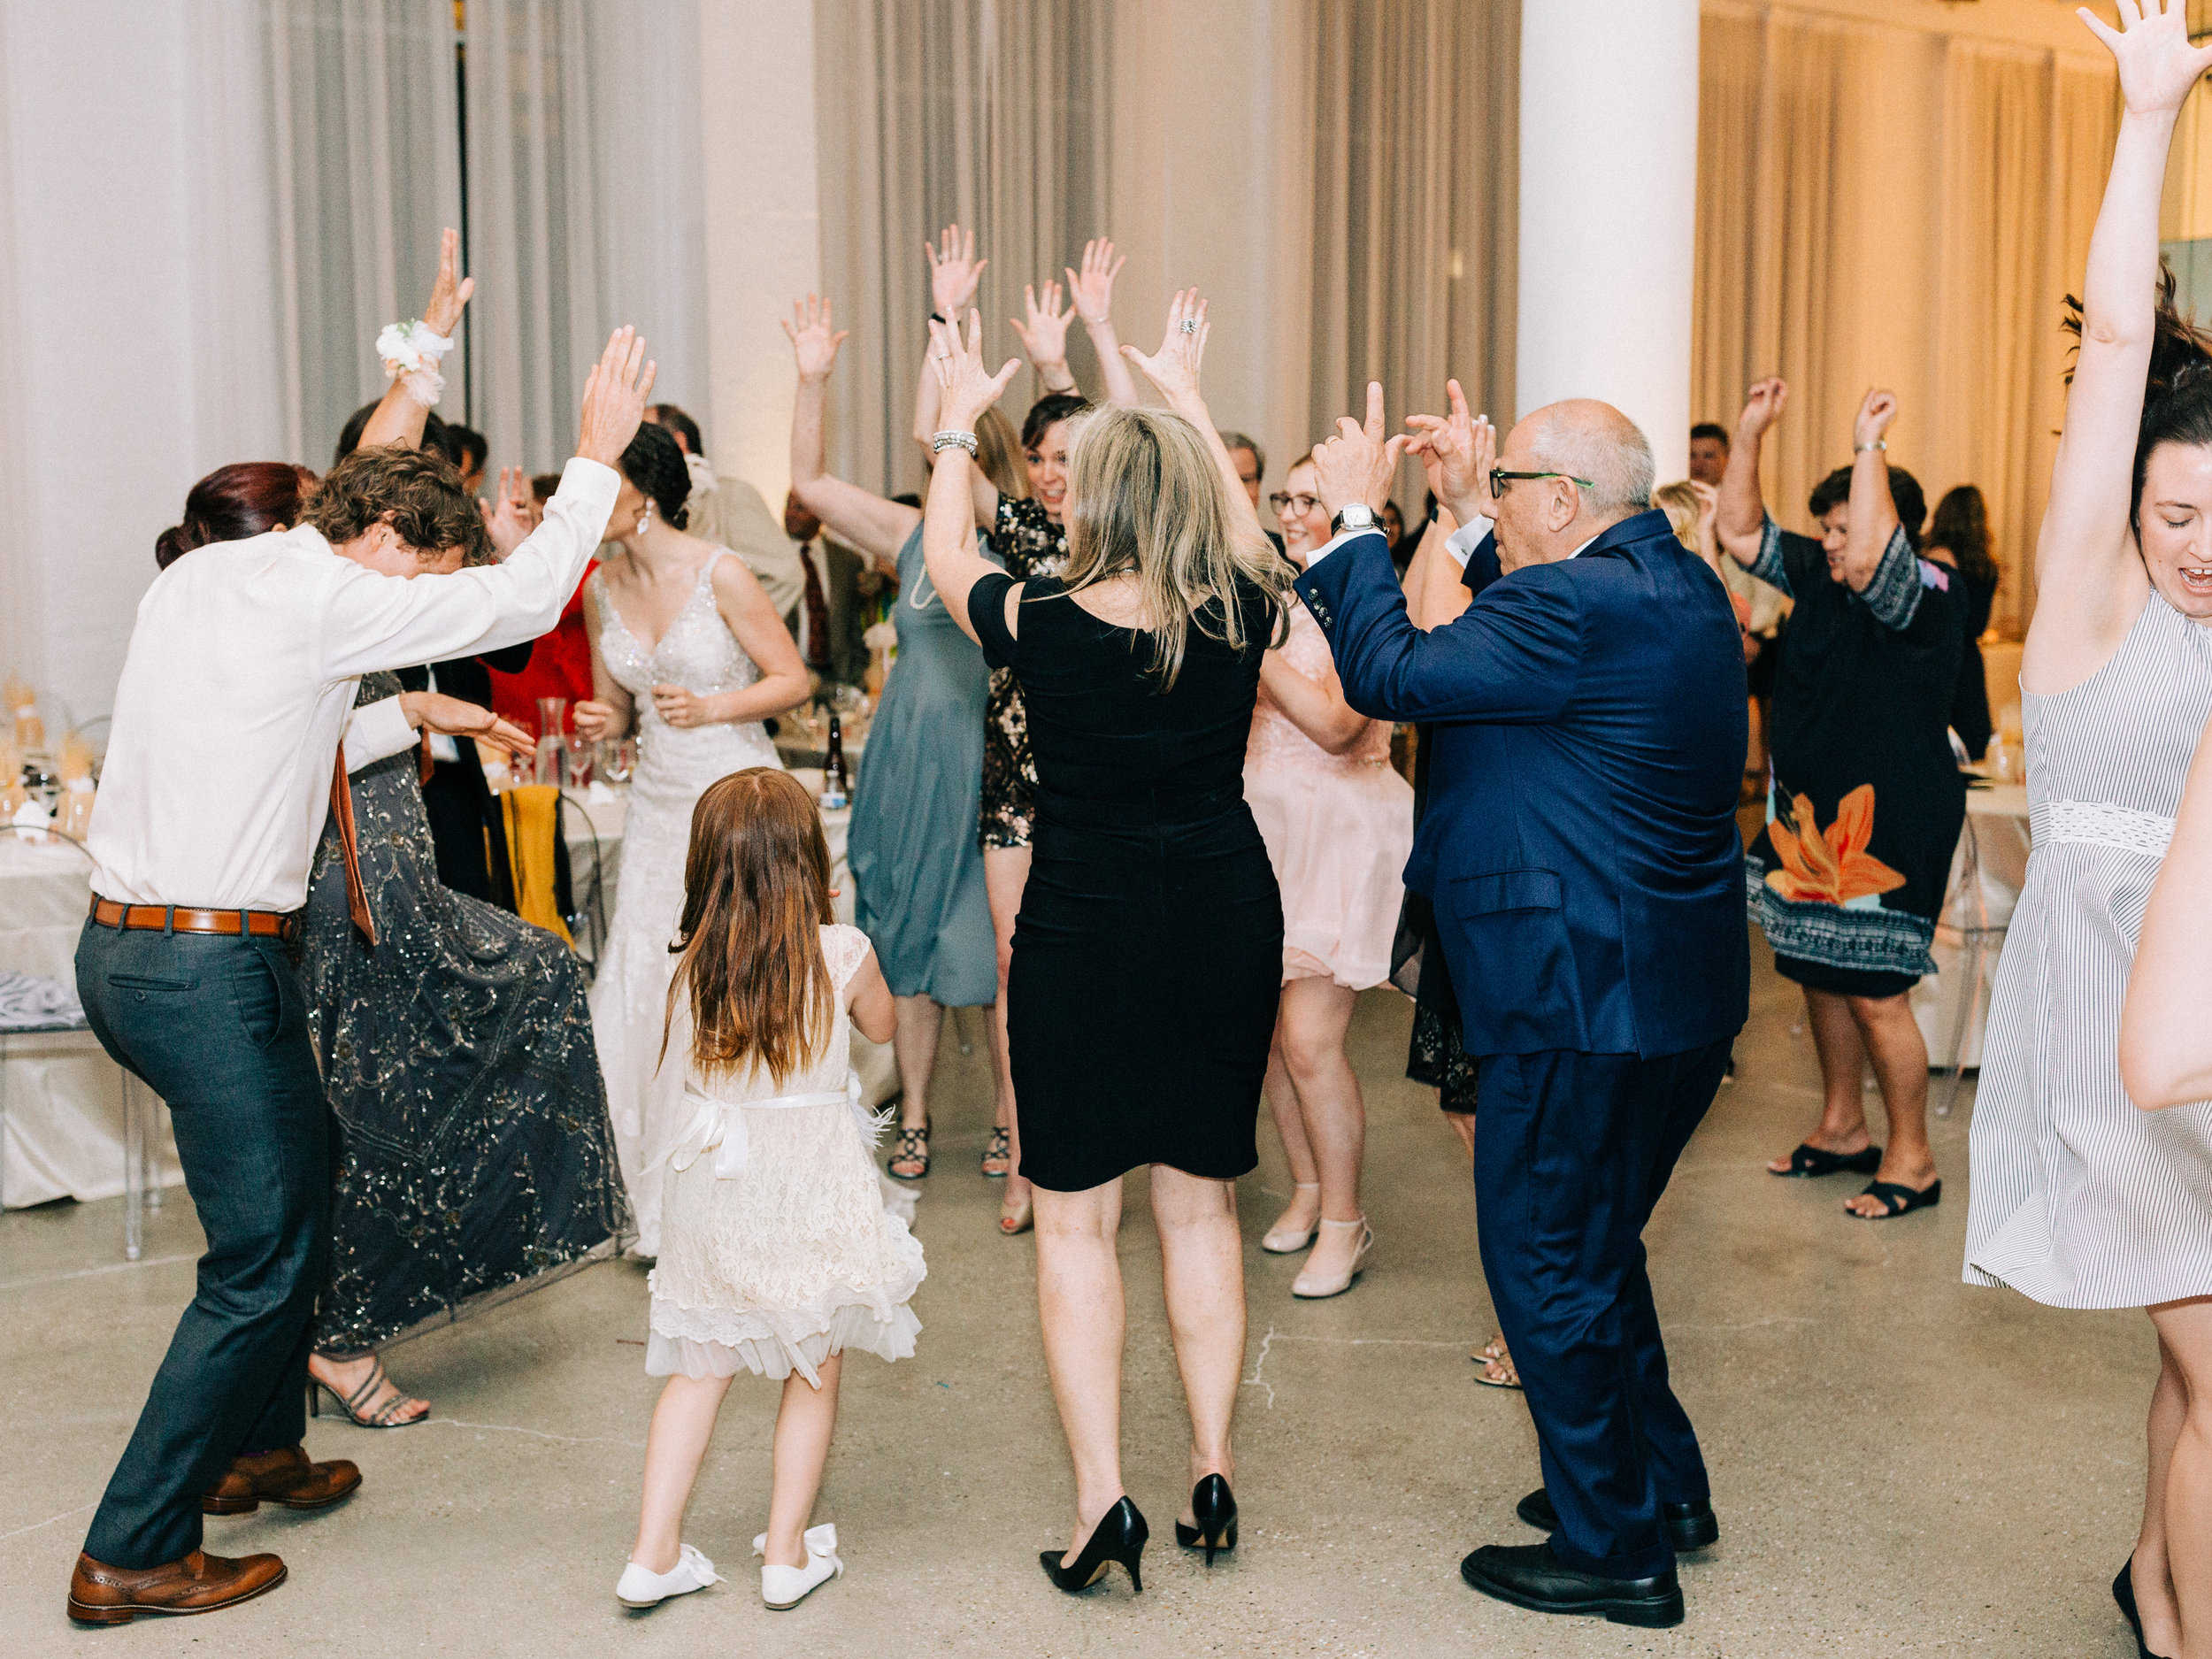 Dorothy_Louise_Photography_University_of_Chicago_Chapel_Wedding-111.jpg